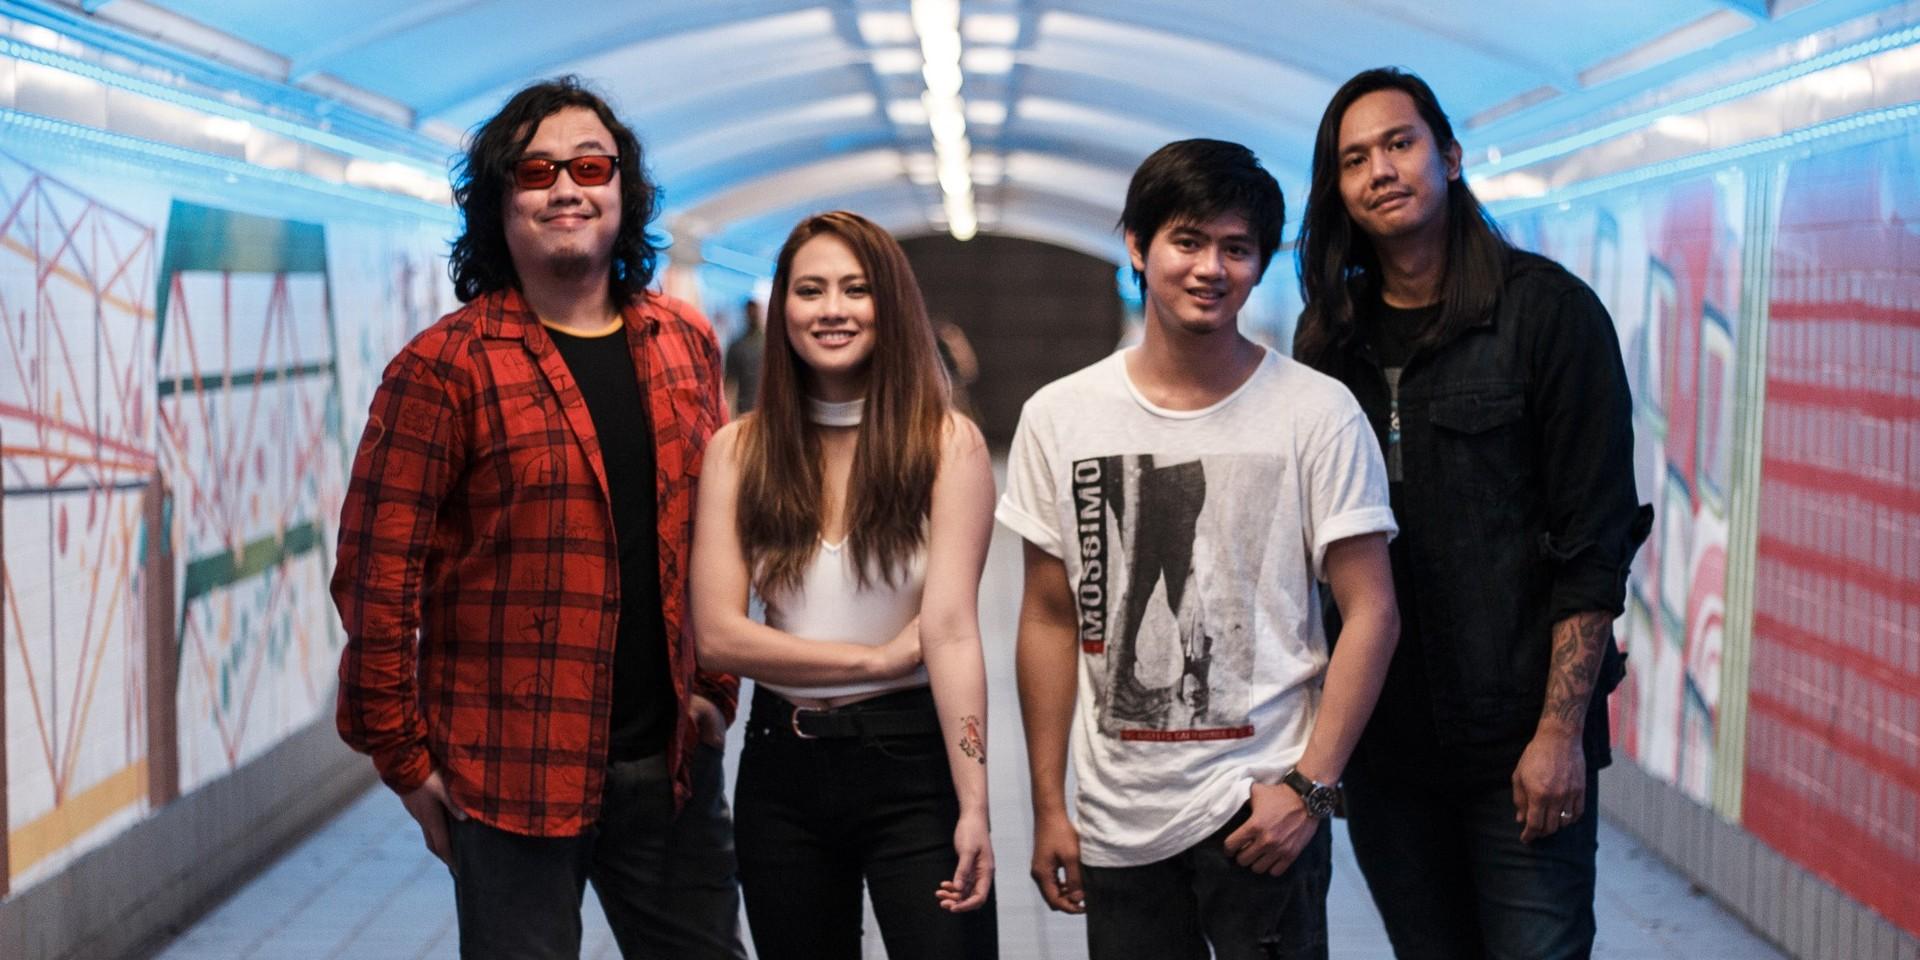 Gracenote to release third studio album Small World in 2020